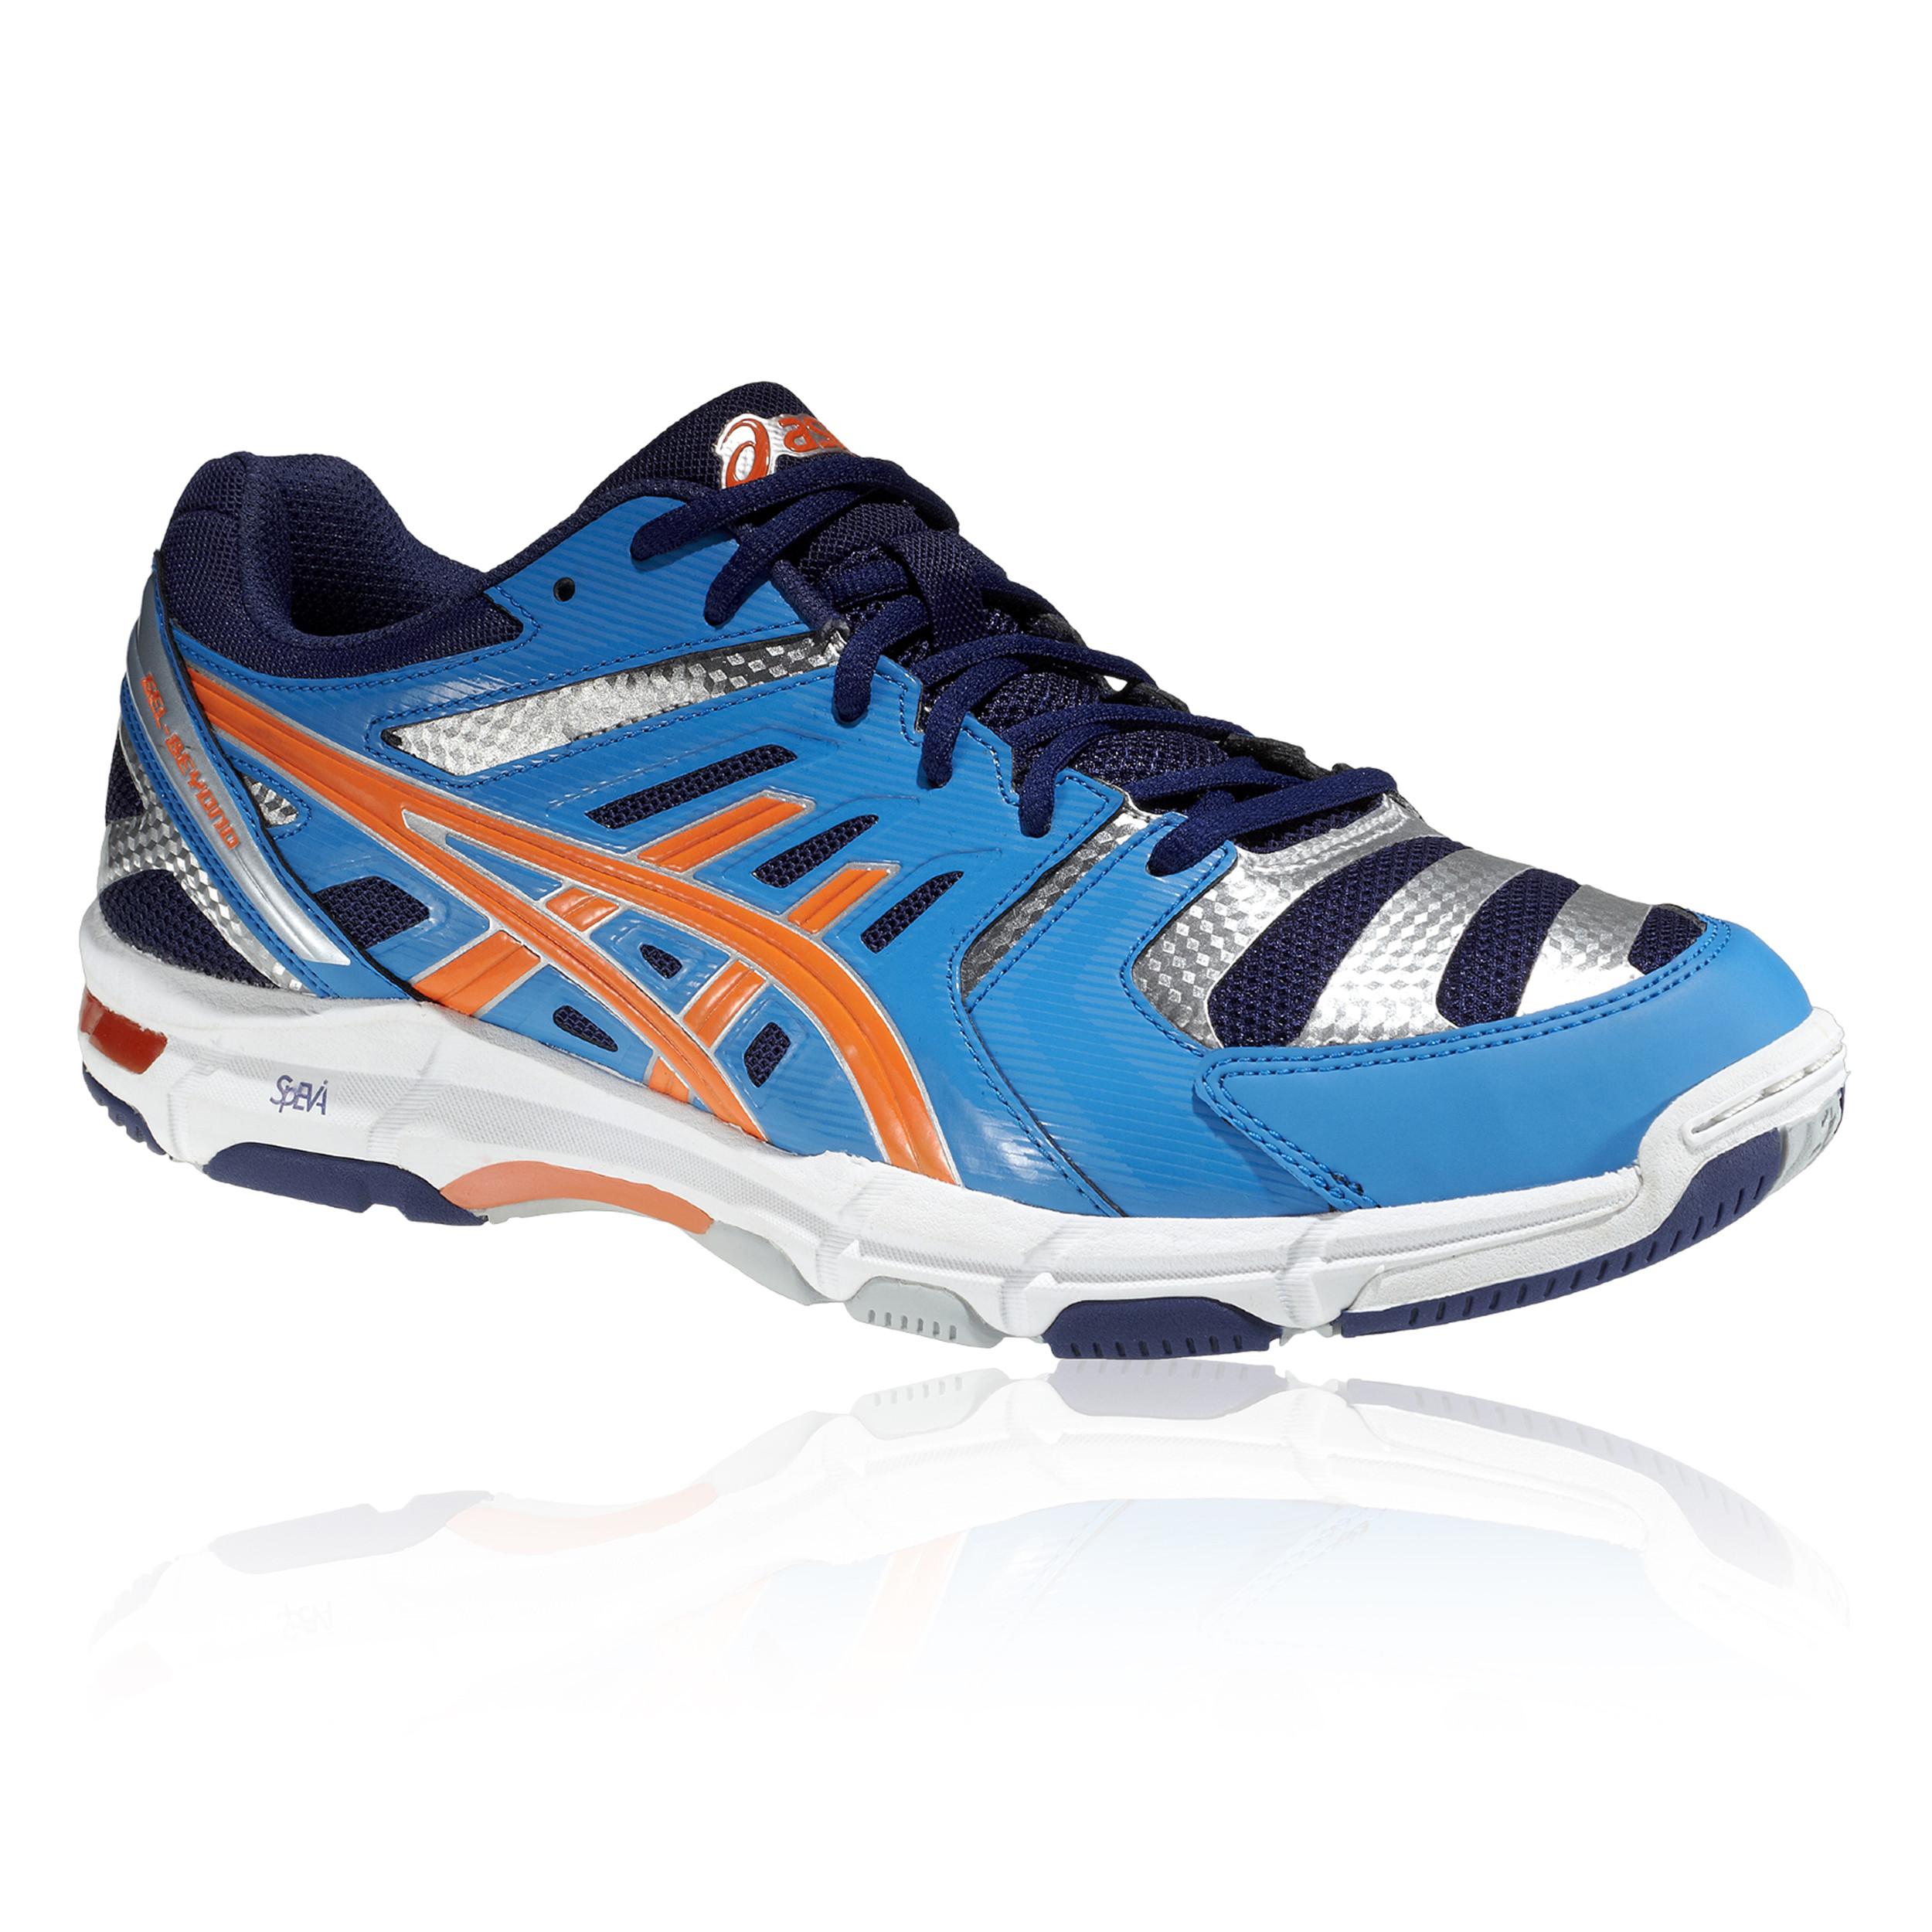 Asics Mens GEL-BEYOND 4 MT Indoor Court Shoes Blue Sports Breathable Lightweight